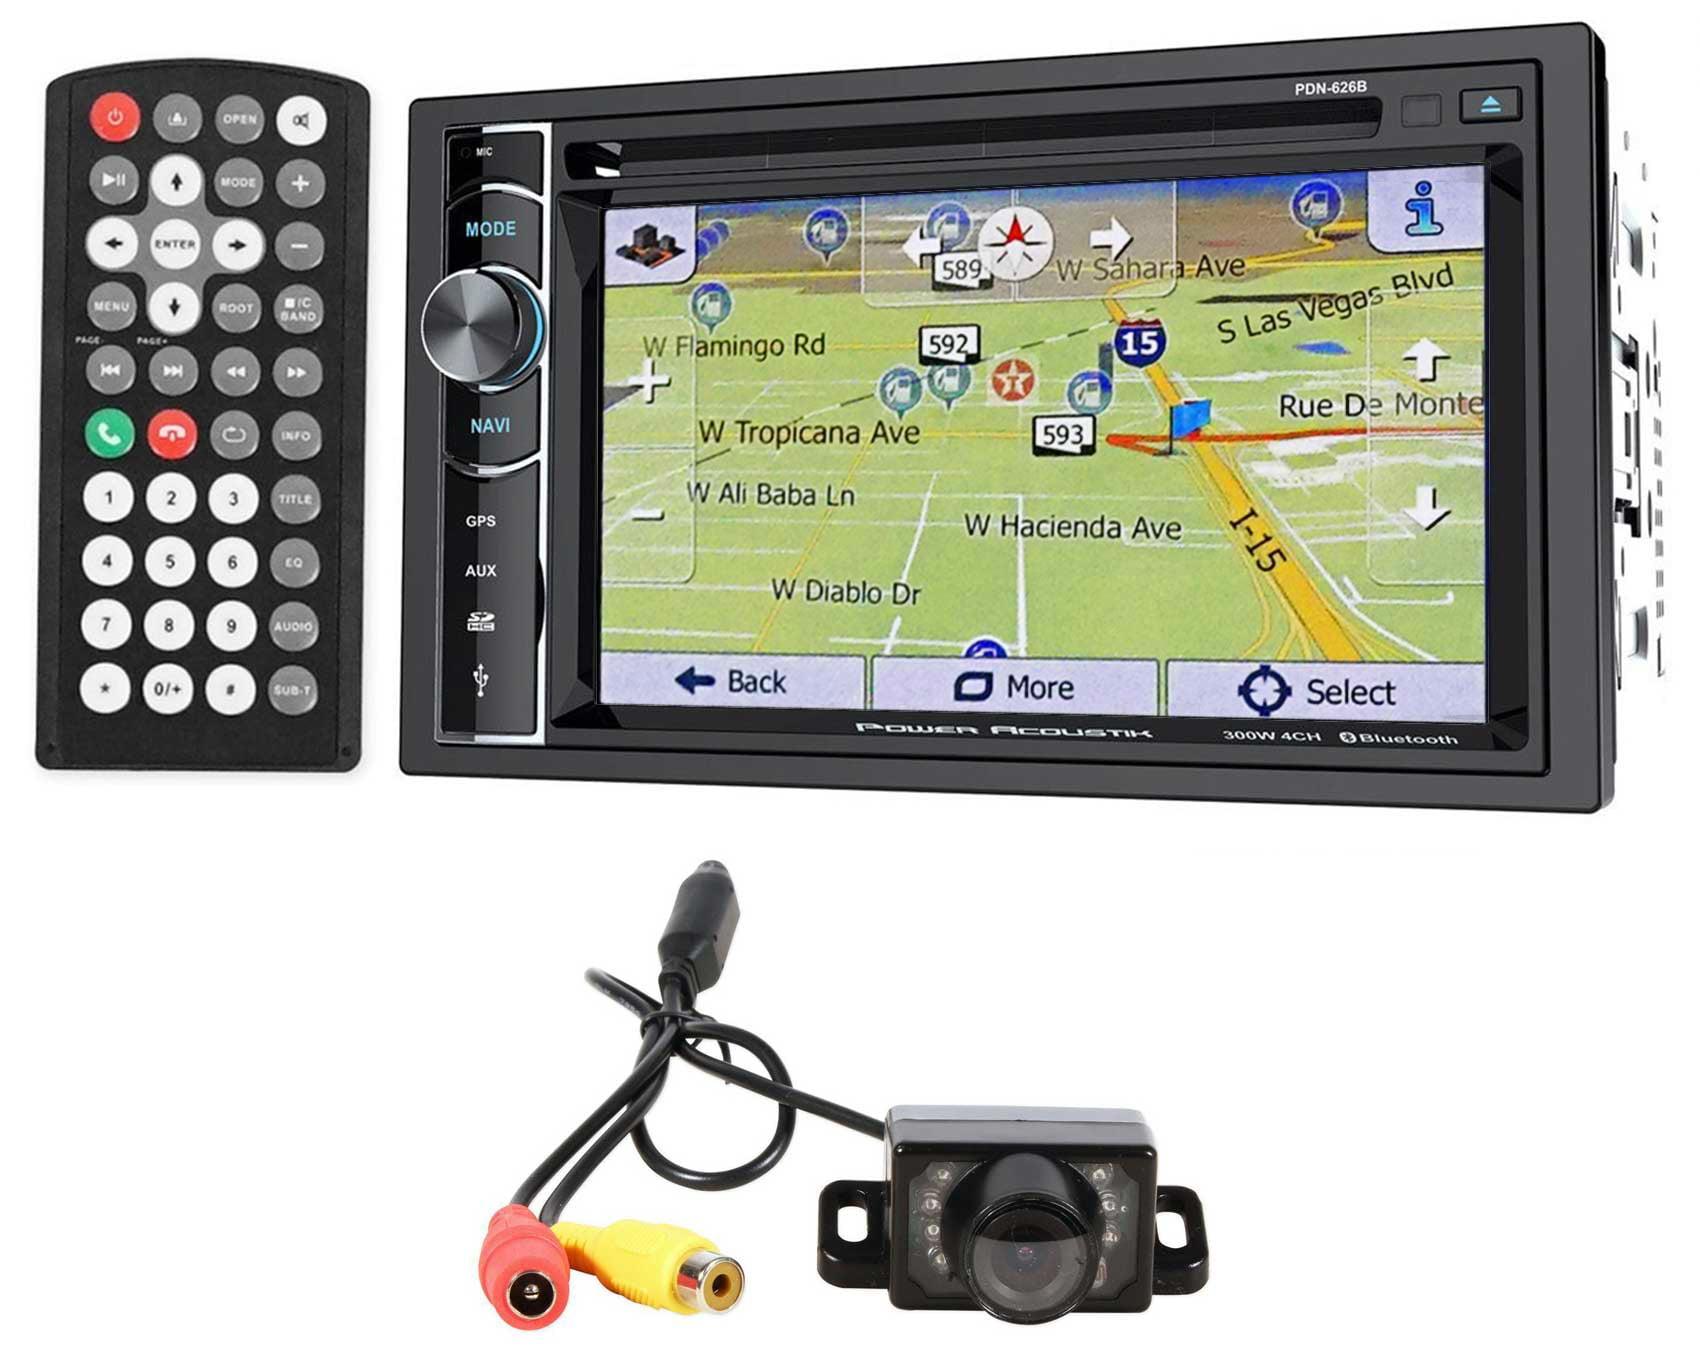 Power Acoustik PDN-626B DVD CD Car Stereo GPS Receiver+Bluetooth+Backup Camera by Power Acoustik